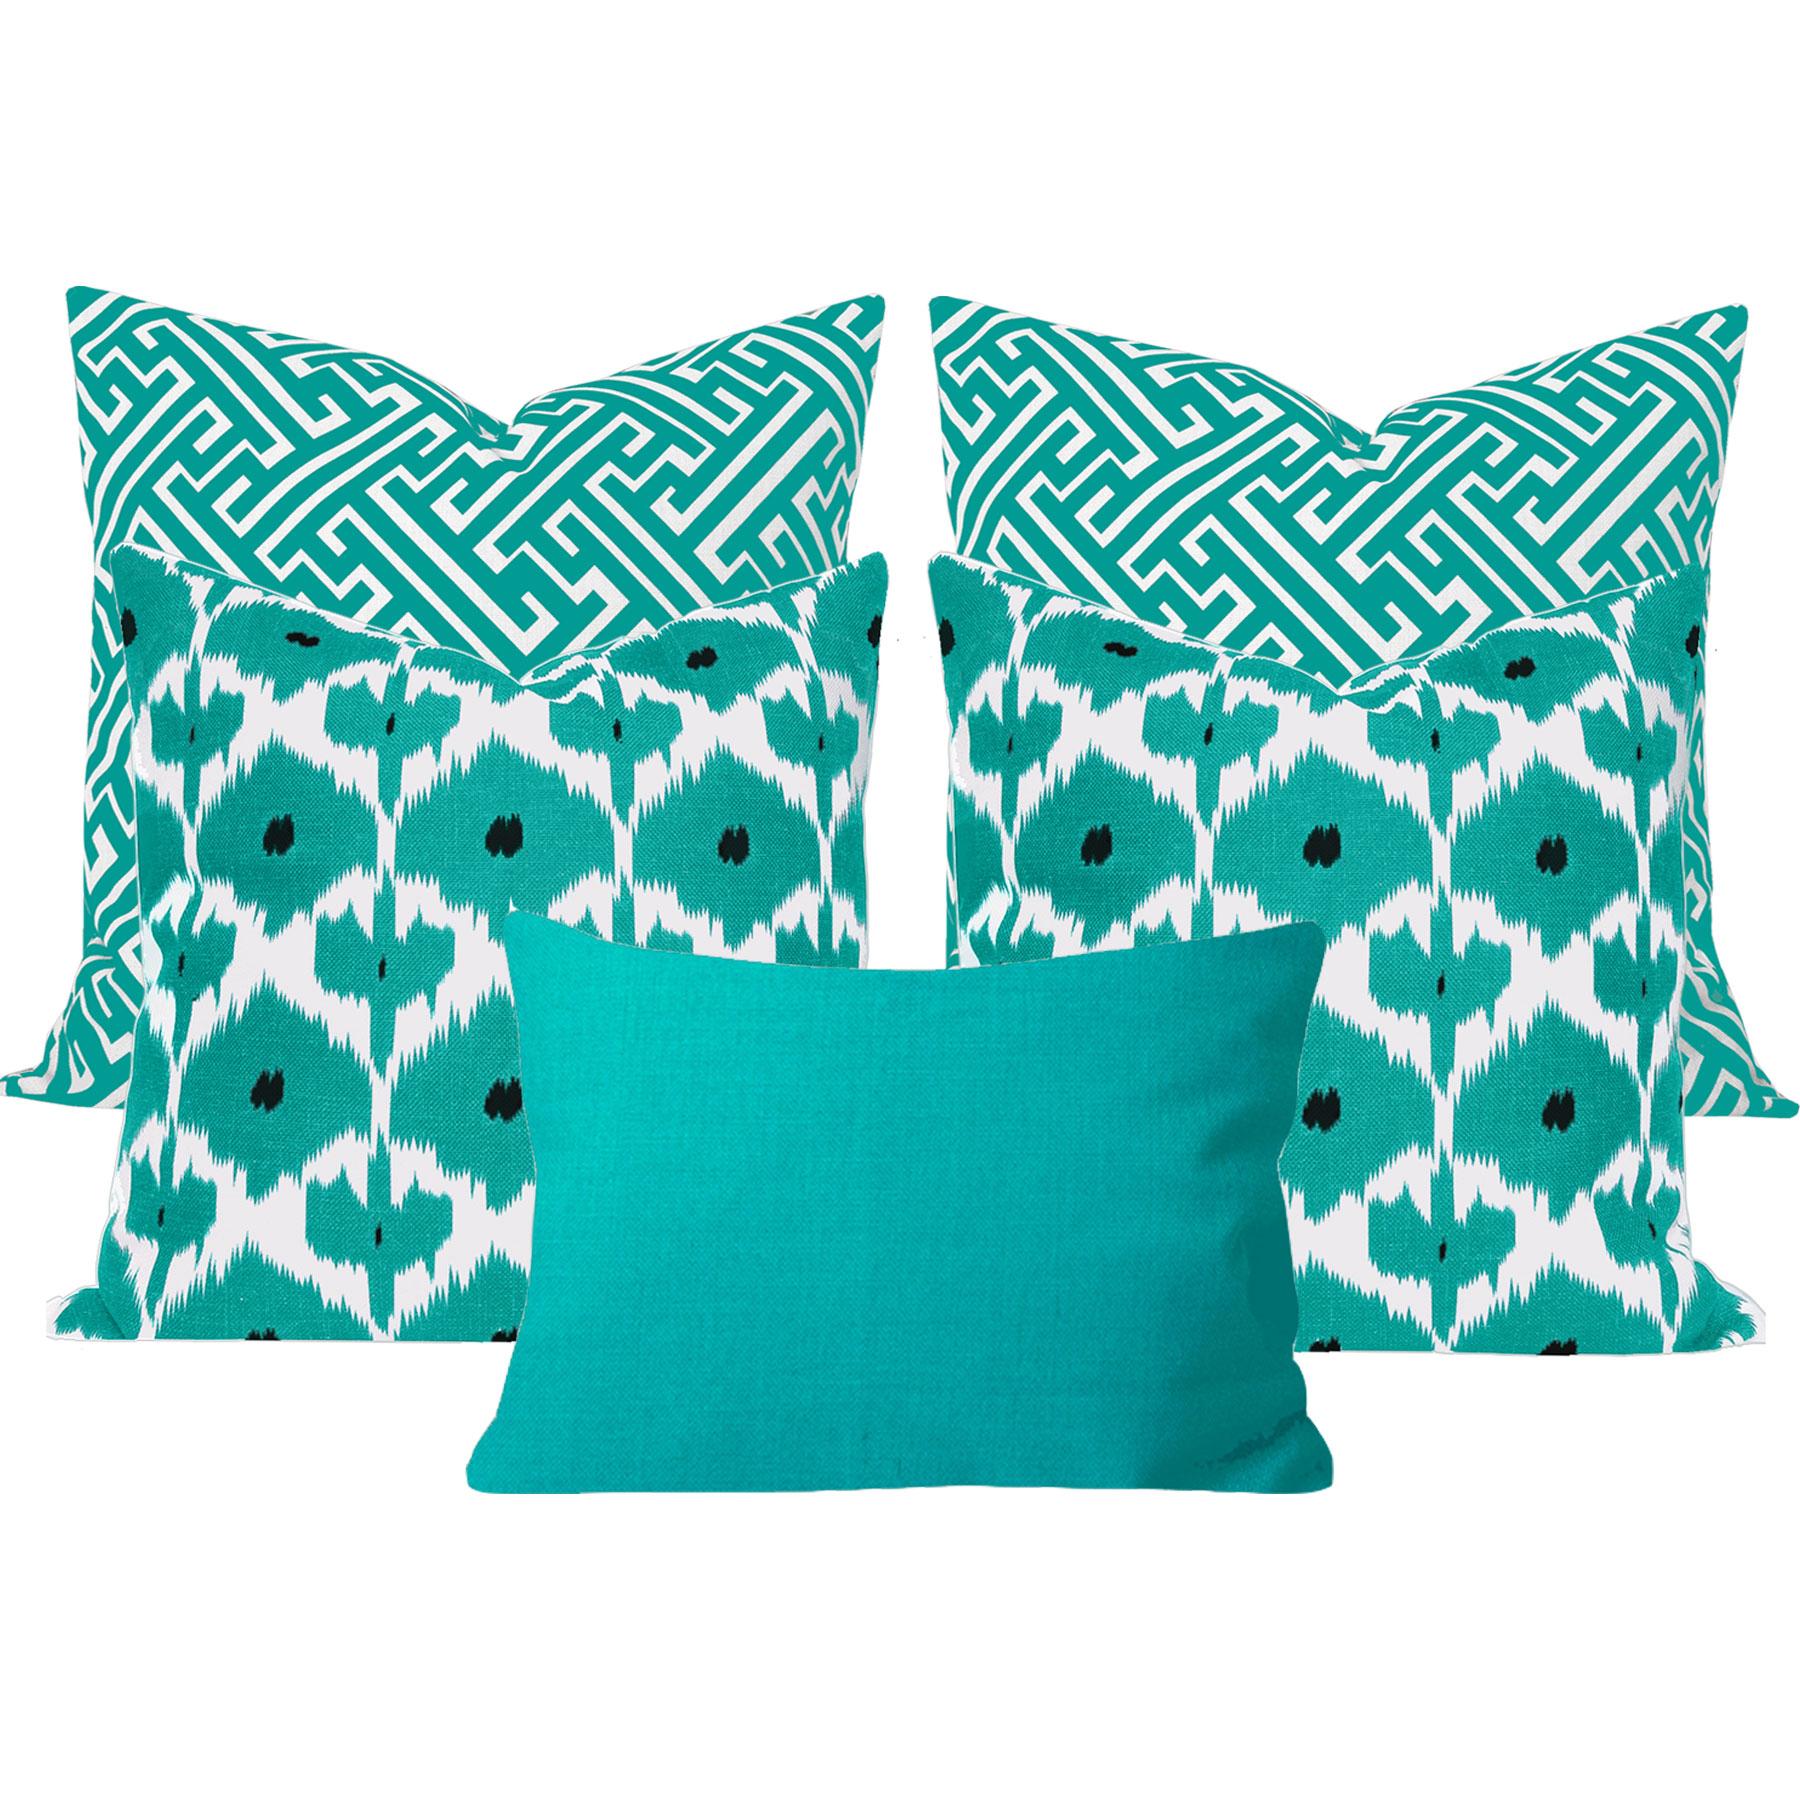 Kristine-Maze-Turquoise-5-Cushon-Set